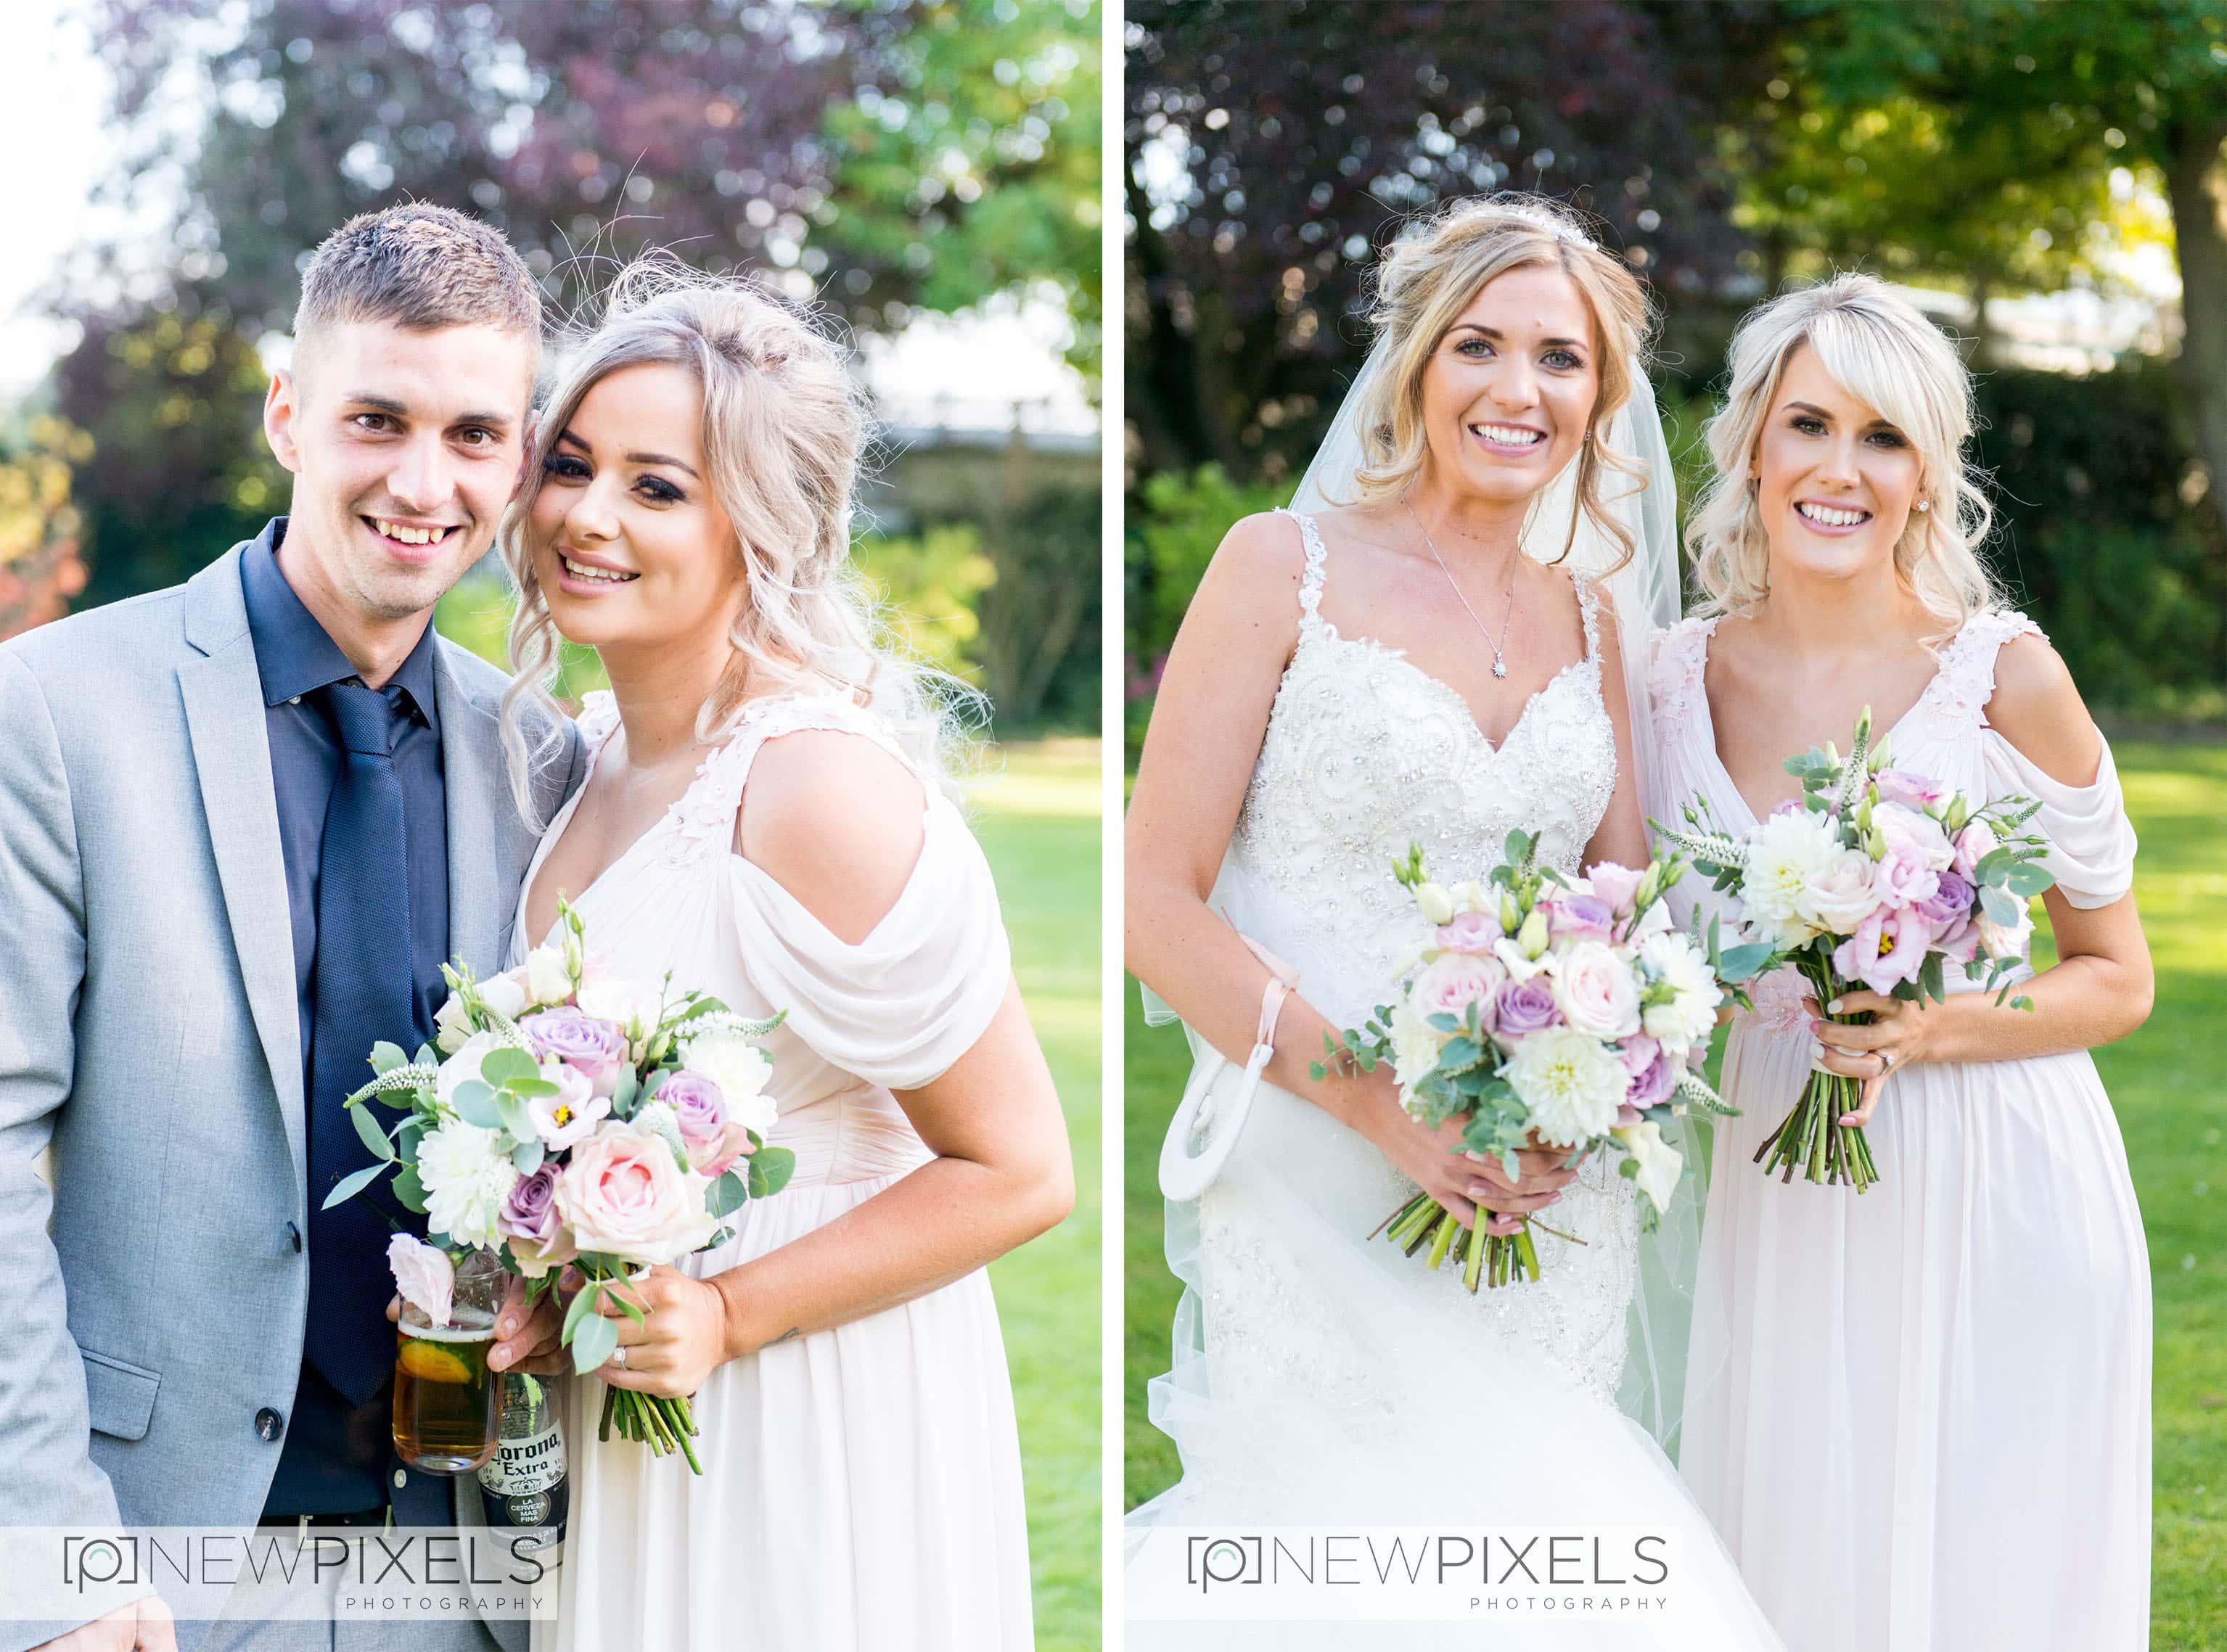 Hertfordshire Wedding Photography13